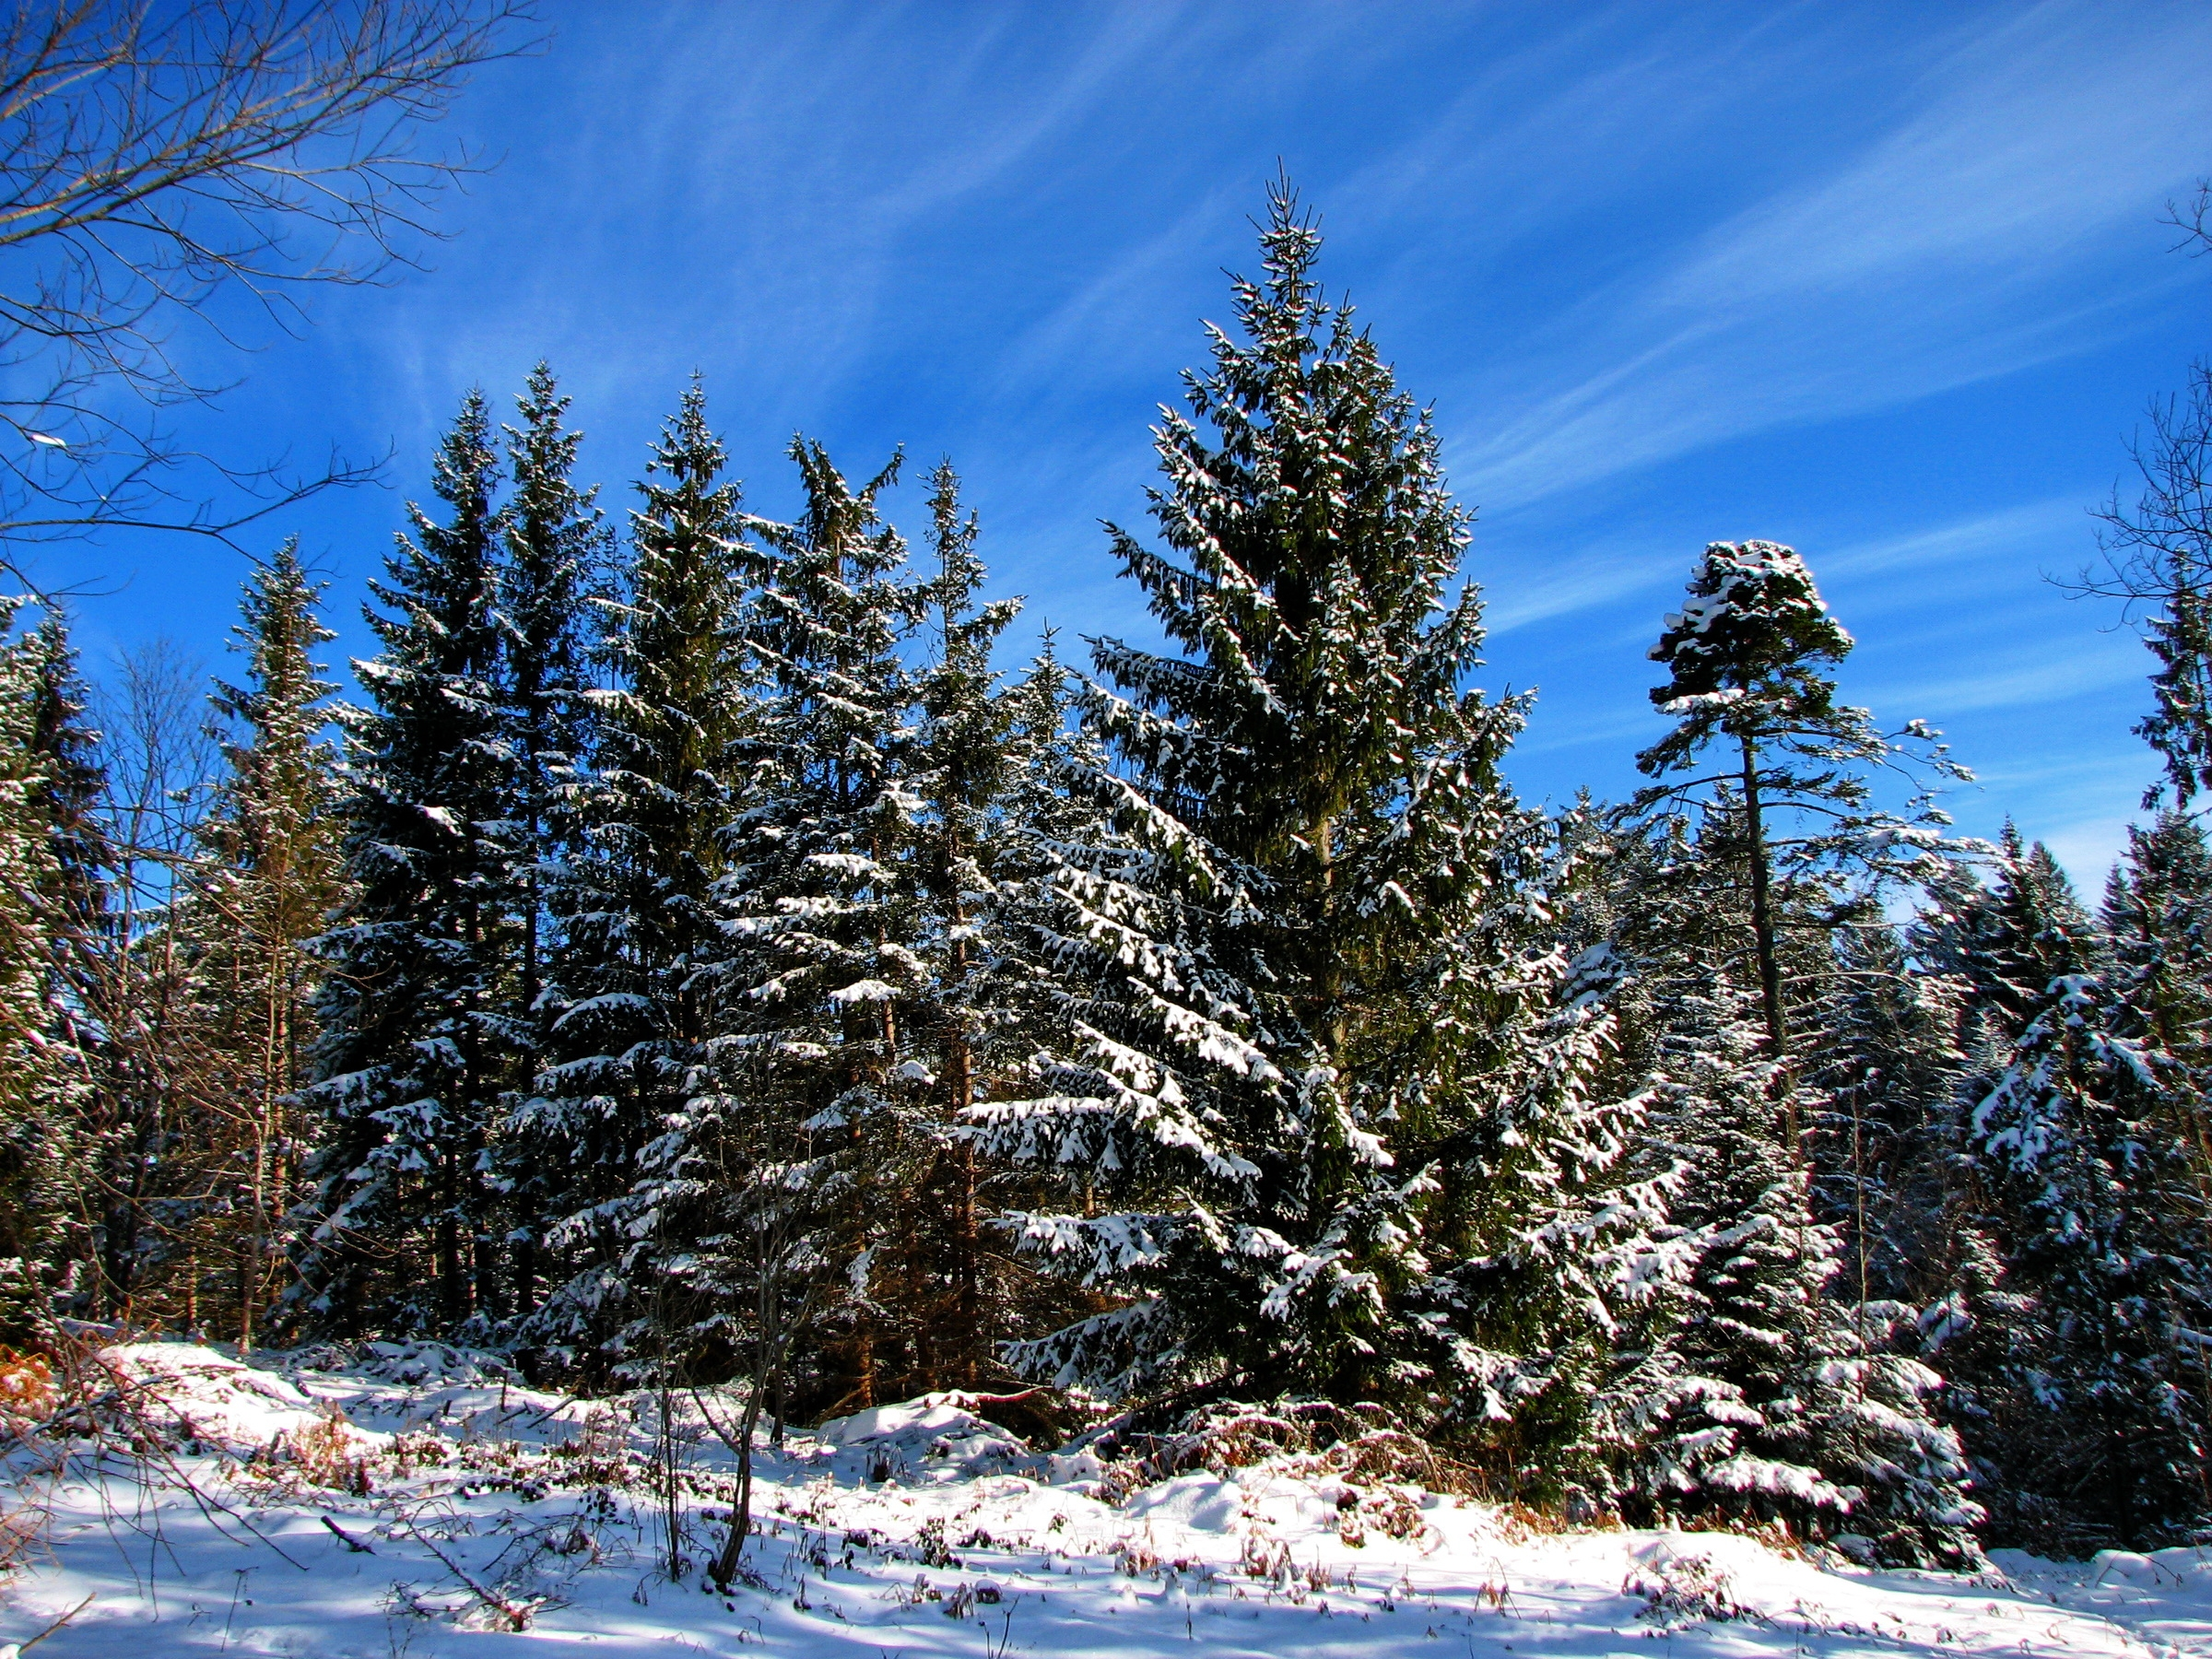 зима, снег, ели, деревья, небо, лес, обои hd